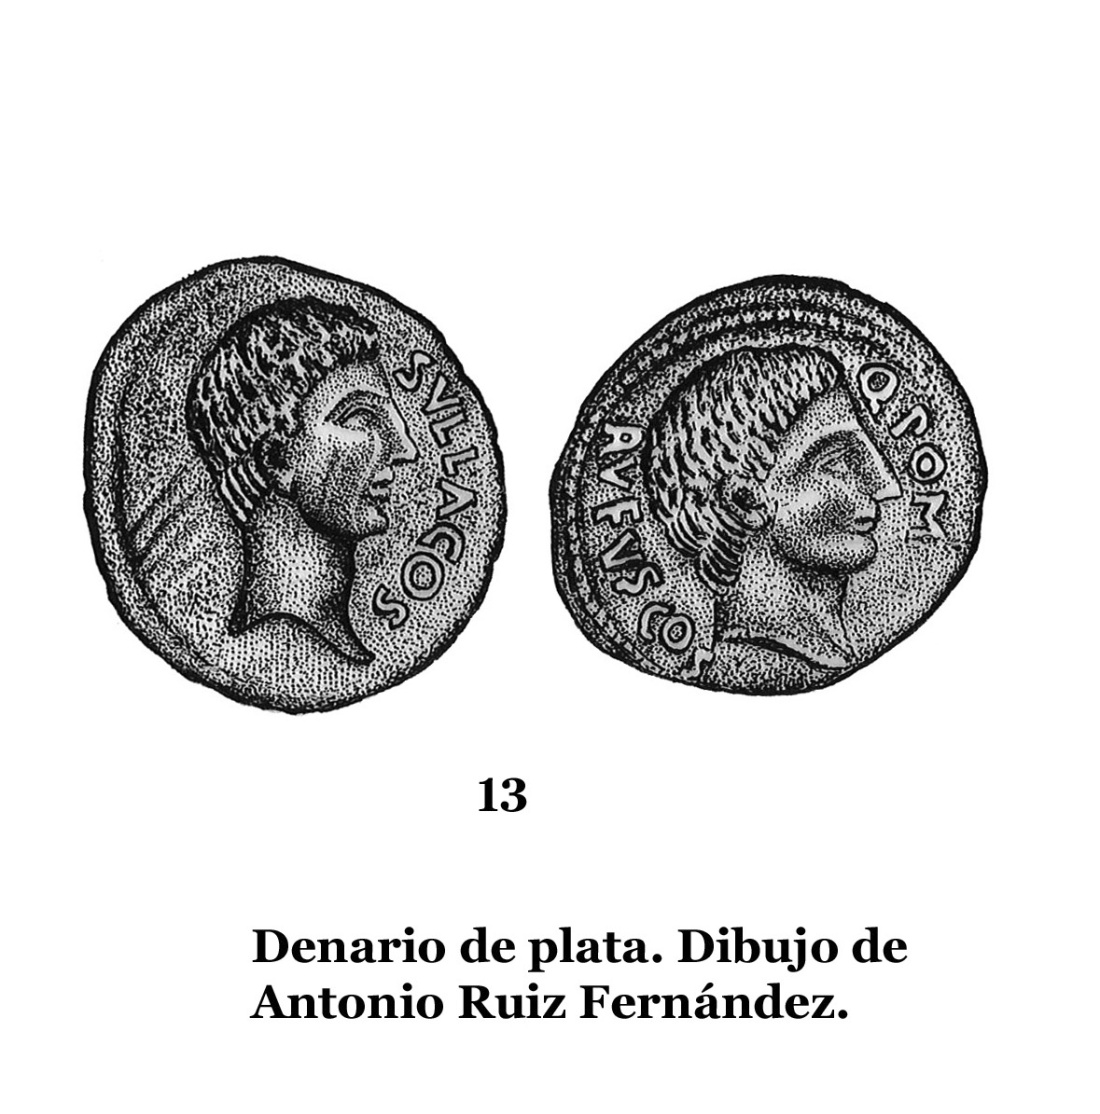 13 DENARIOS DE PLATA, DIBUJOS 13